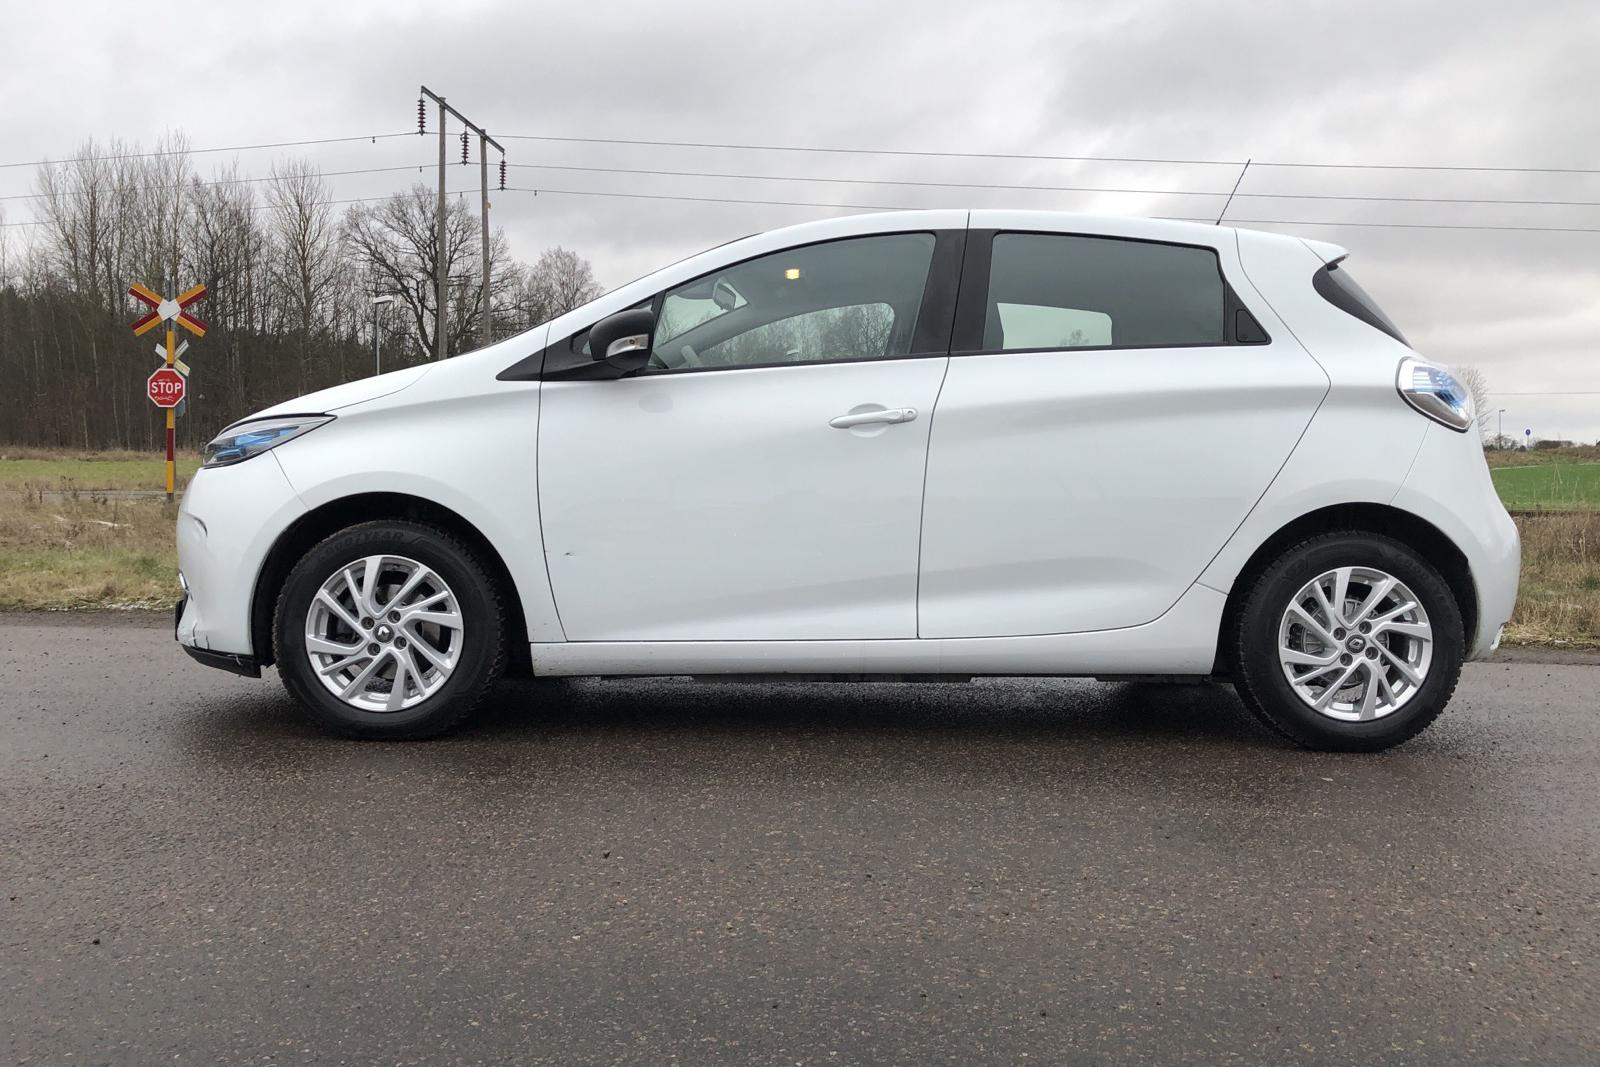 Renault Zoe 41 kWh R90 (92hk) - 7 278 mil - Automat - vit - 2019